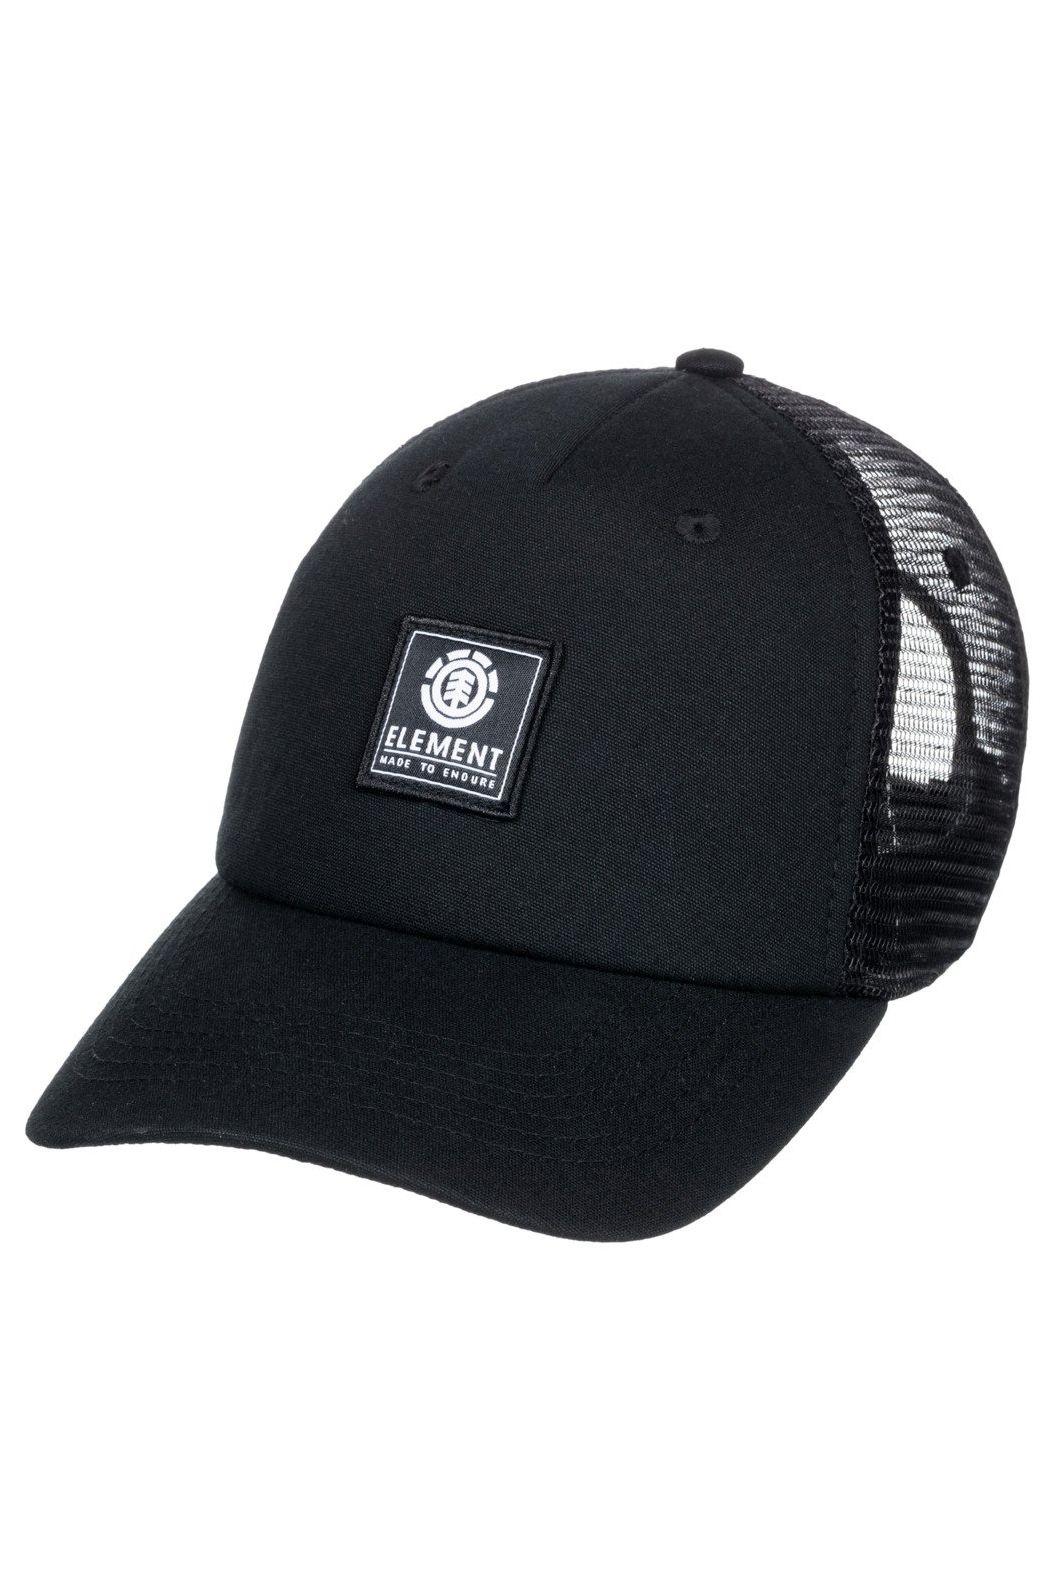 Element Cap   ICON MESH All Black